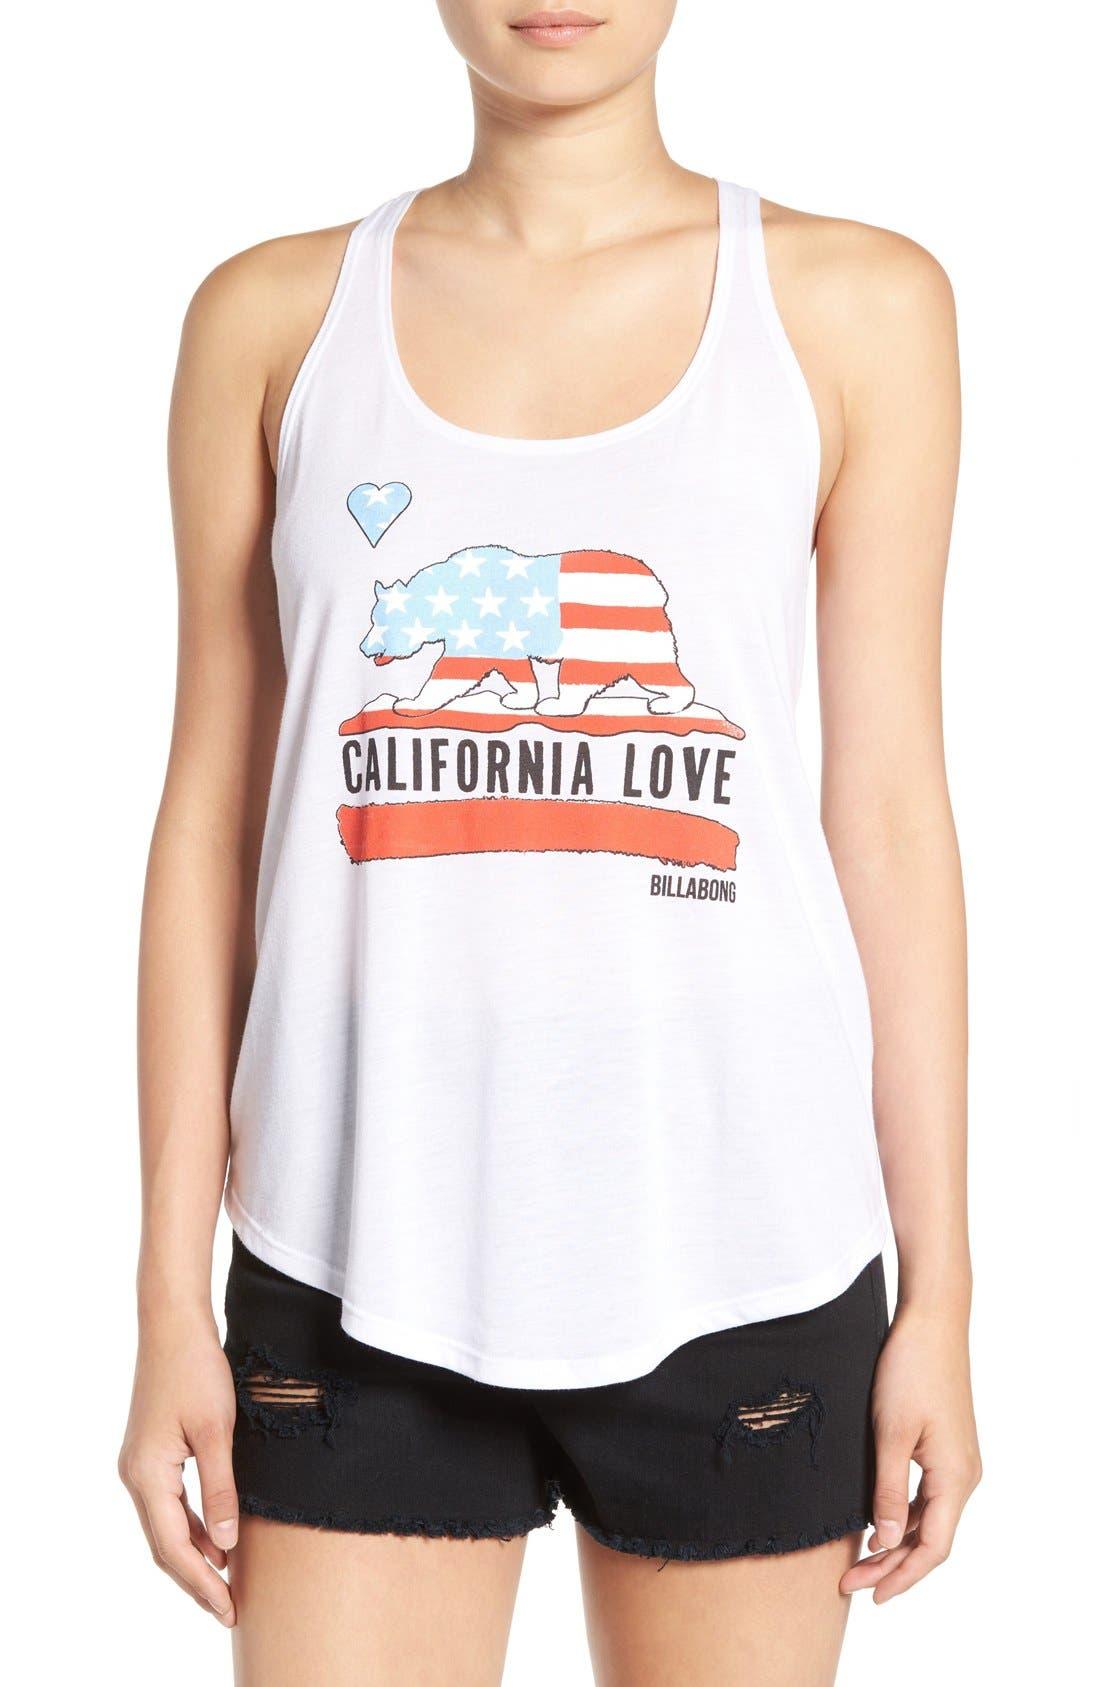 Main Image - Billabong 'California Love' Graphic Tank